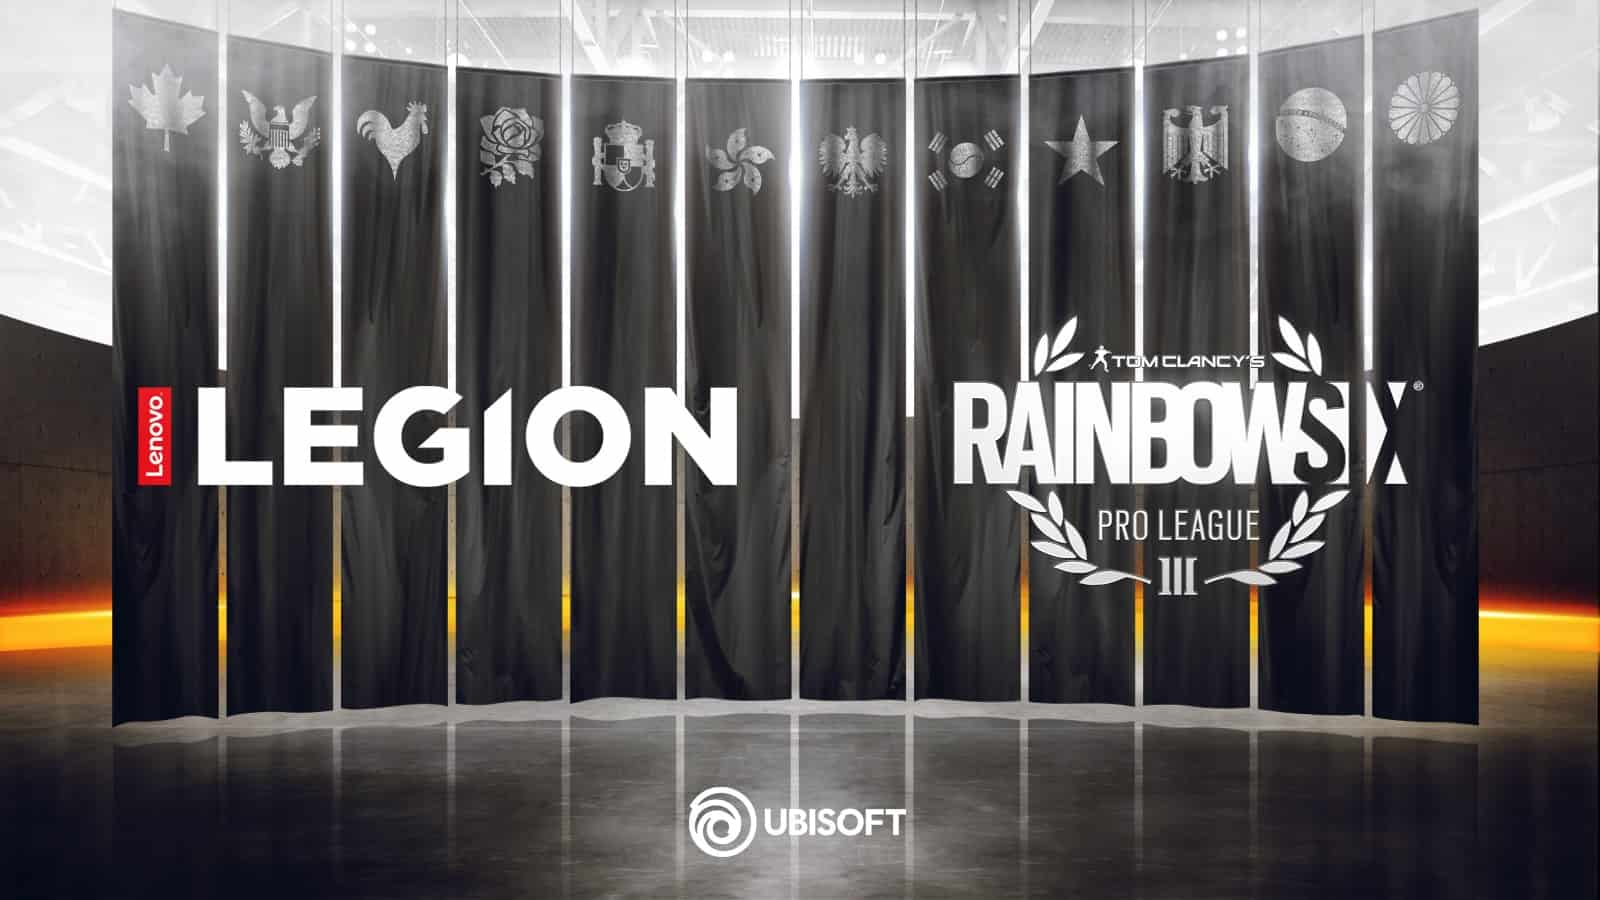 Lenovo Legion Ubisoft R6S 2 1600x900 - LENOVO partner ufficiale di Ubisoft Rainbow Six pro League